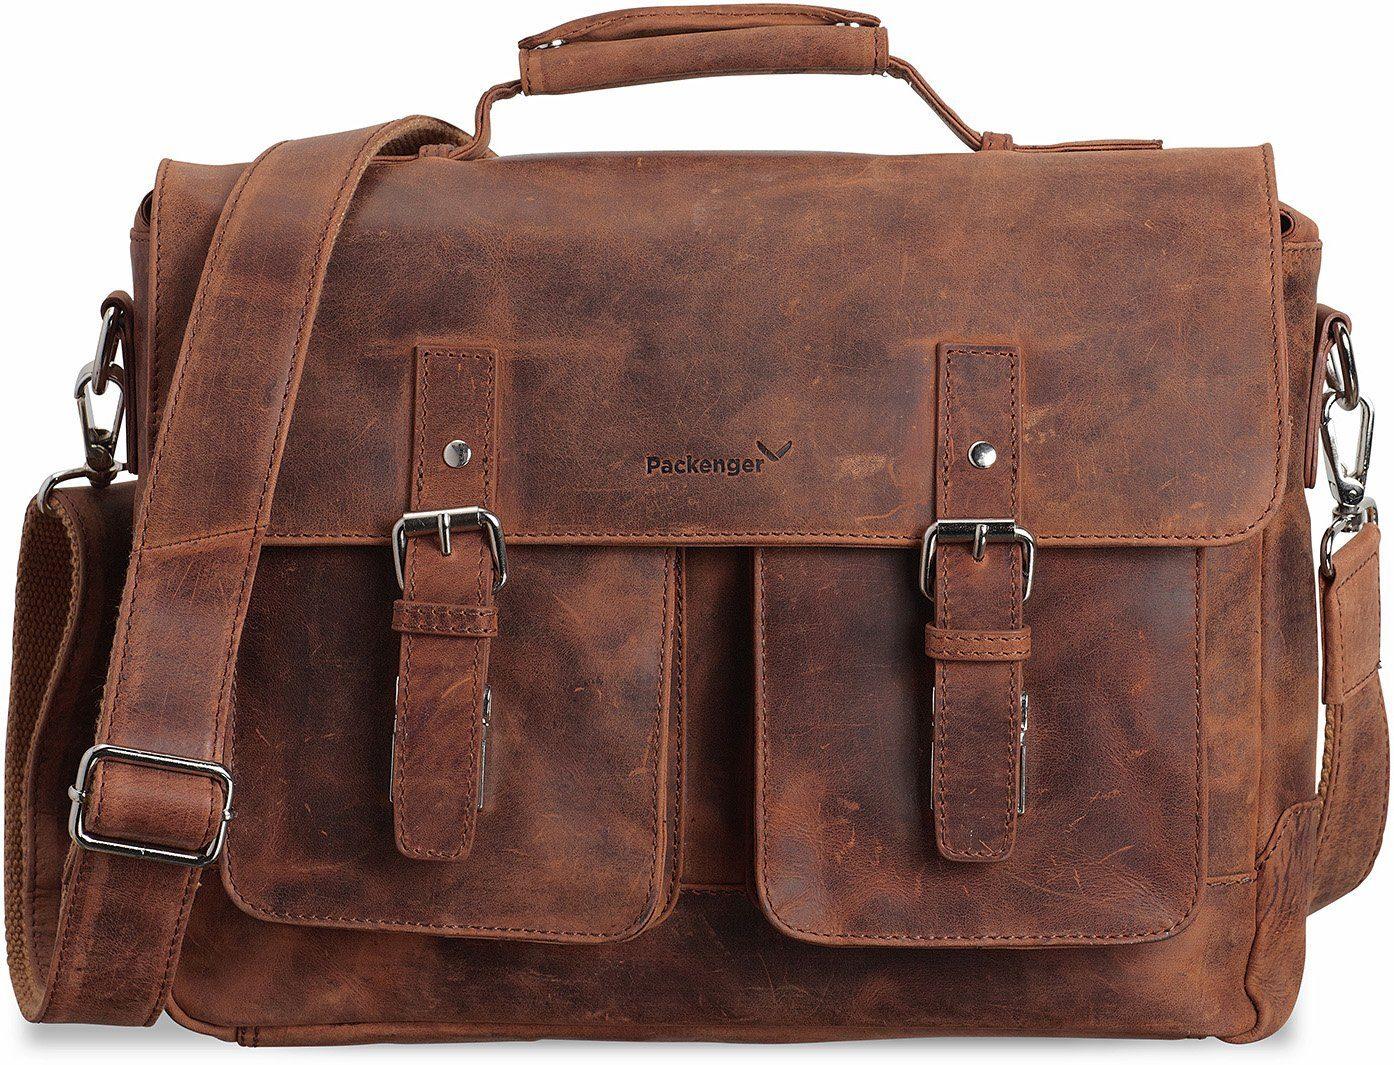 Packenger Umhängetasche mit 15-Zoll Laptopfach, »Kolbjorn, cognac«